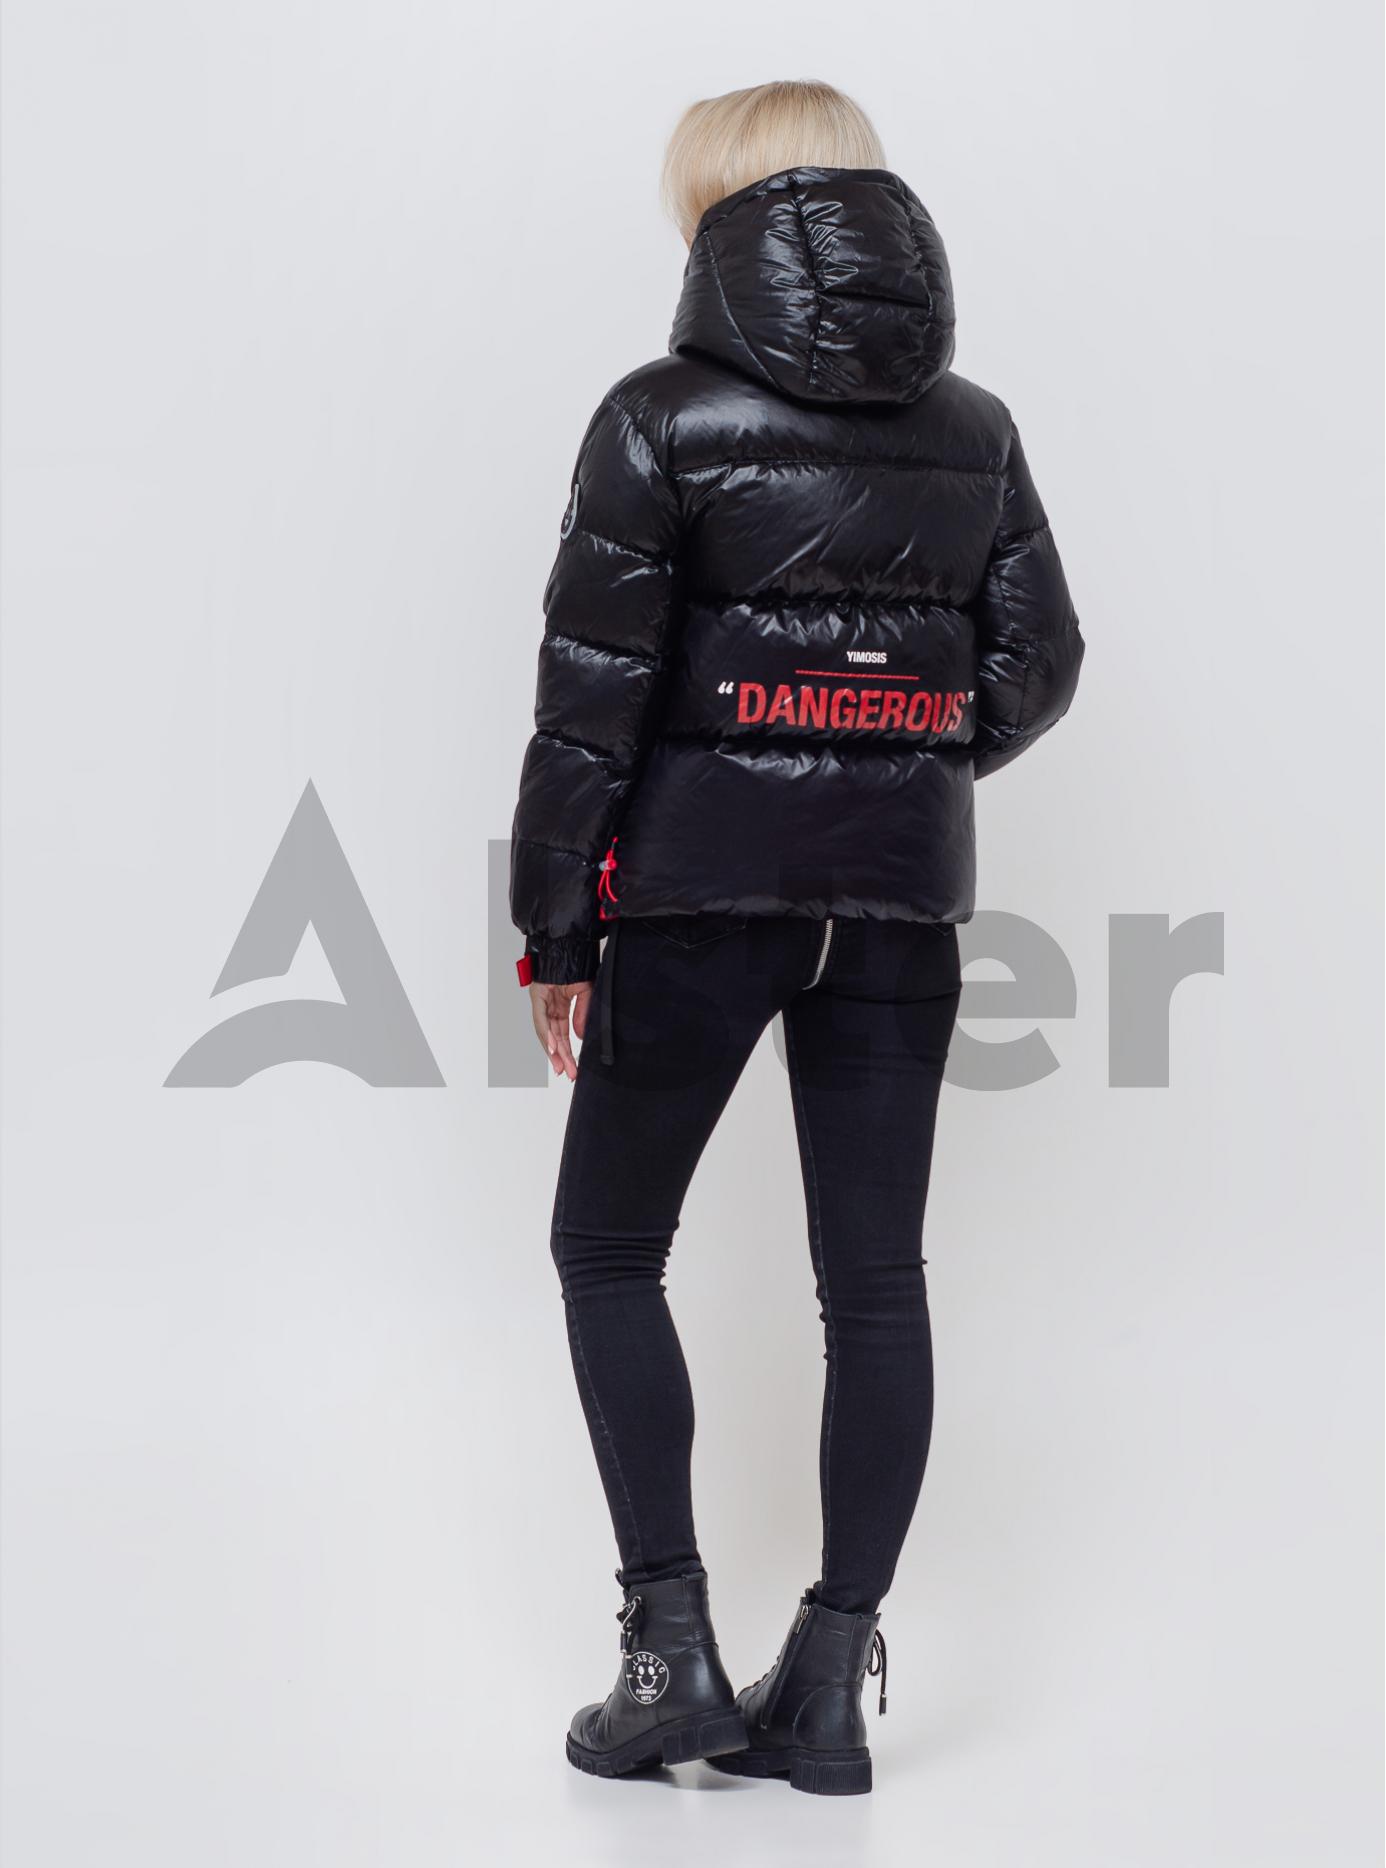 Пуховик женский Чёрный S (05-SV201159): фото - Alster.ua